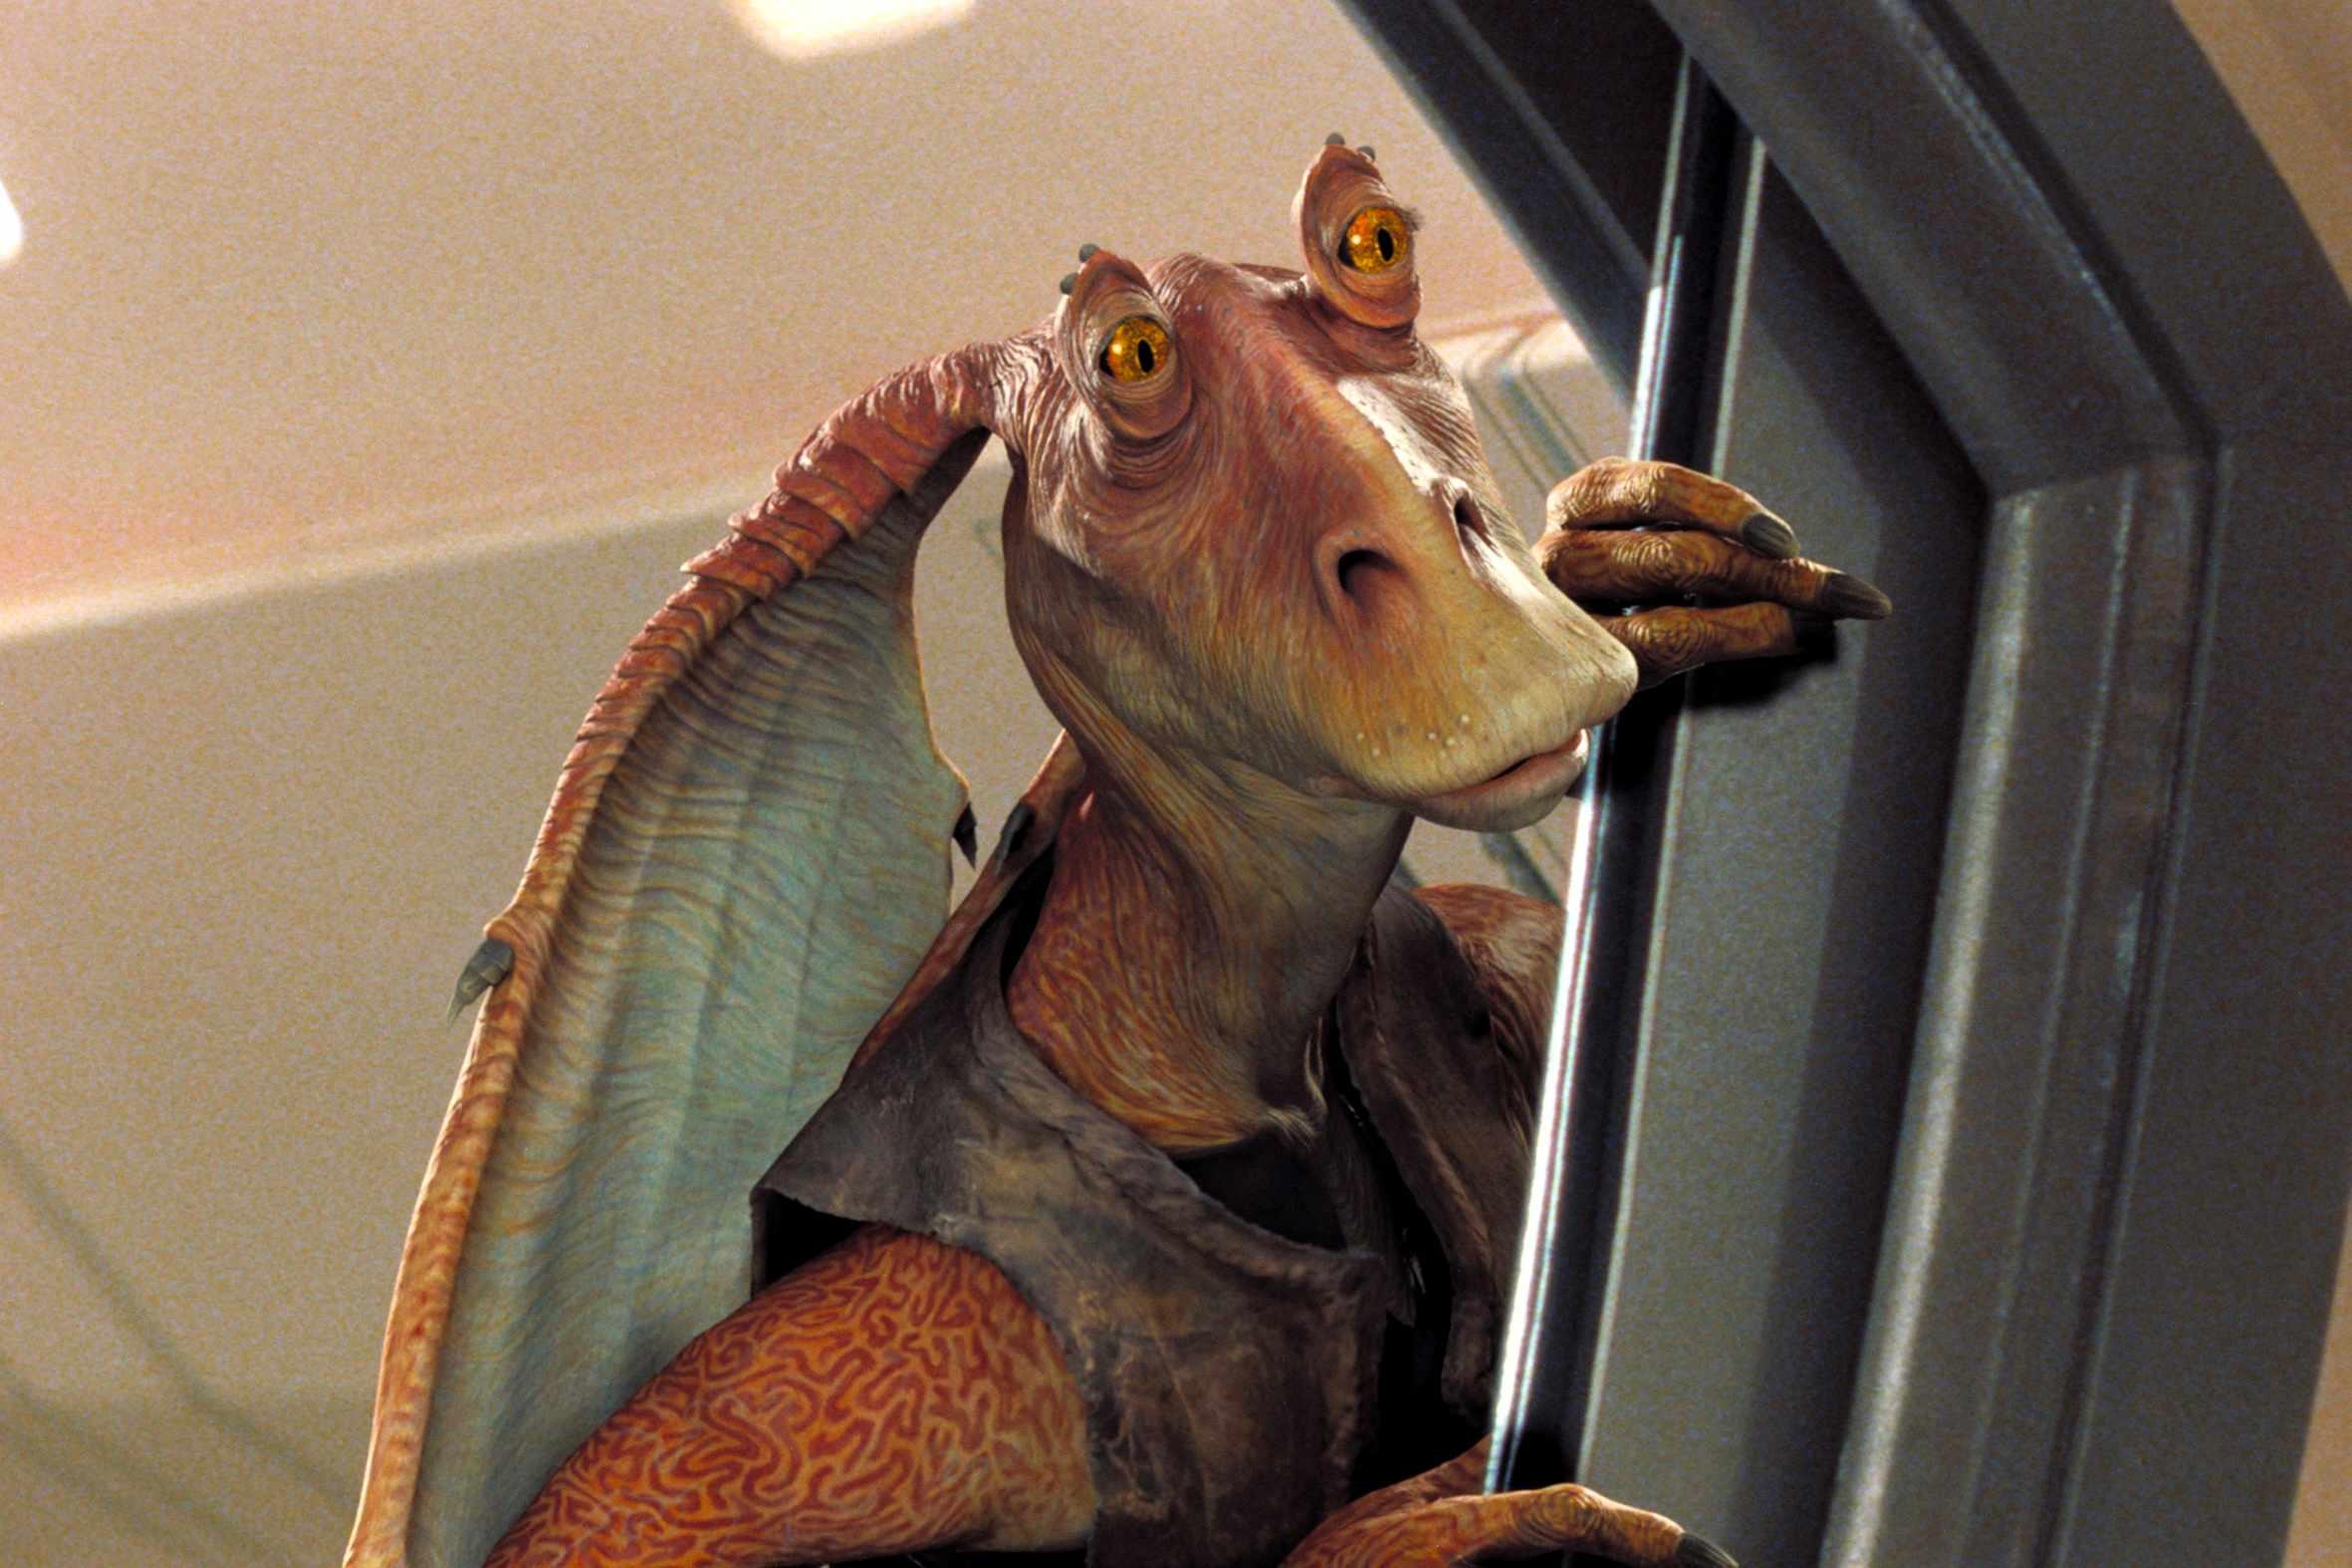 Star Wars Episode I: The Phantom Menace - Unit Stills